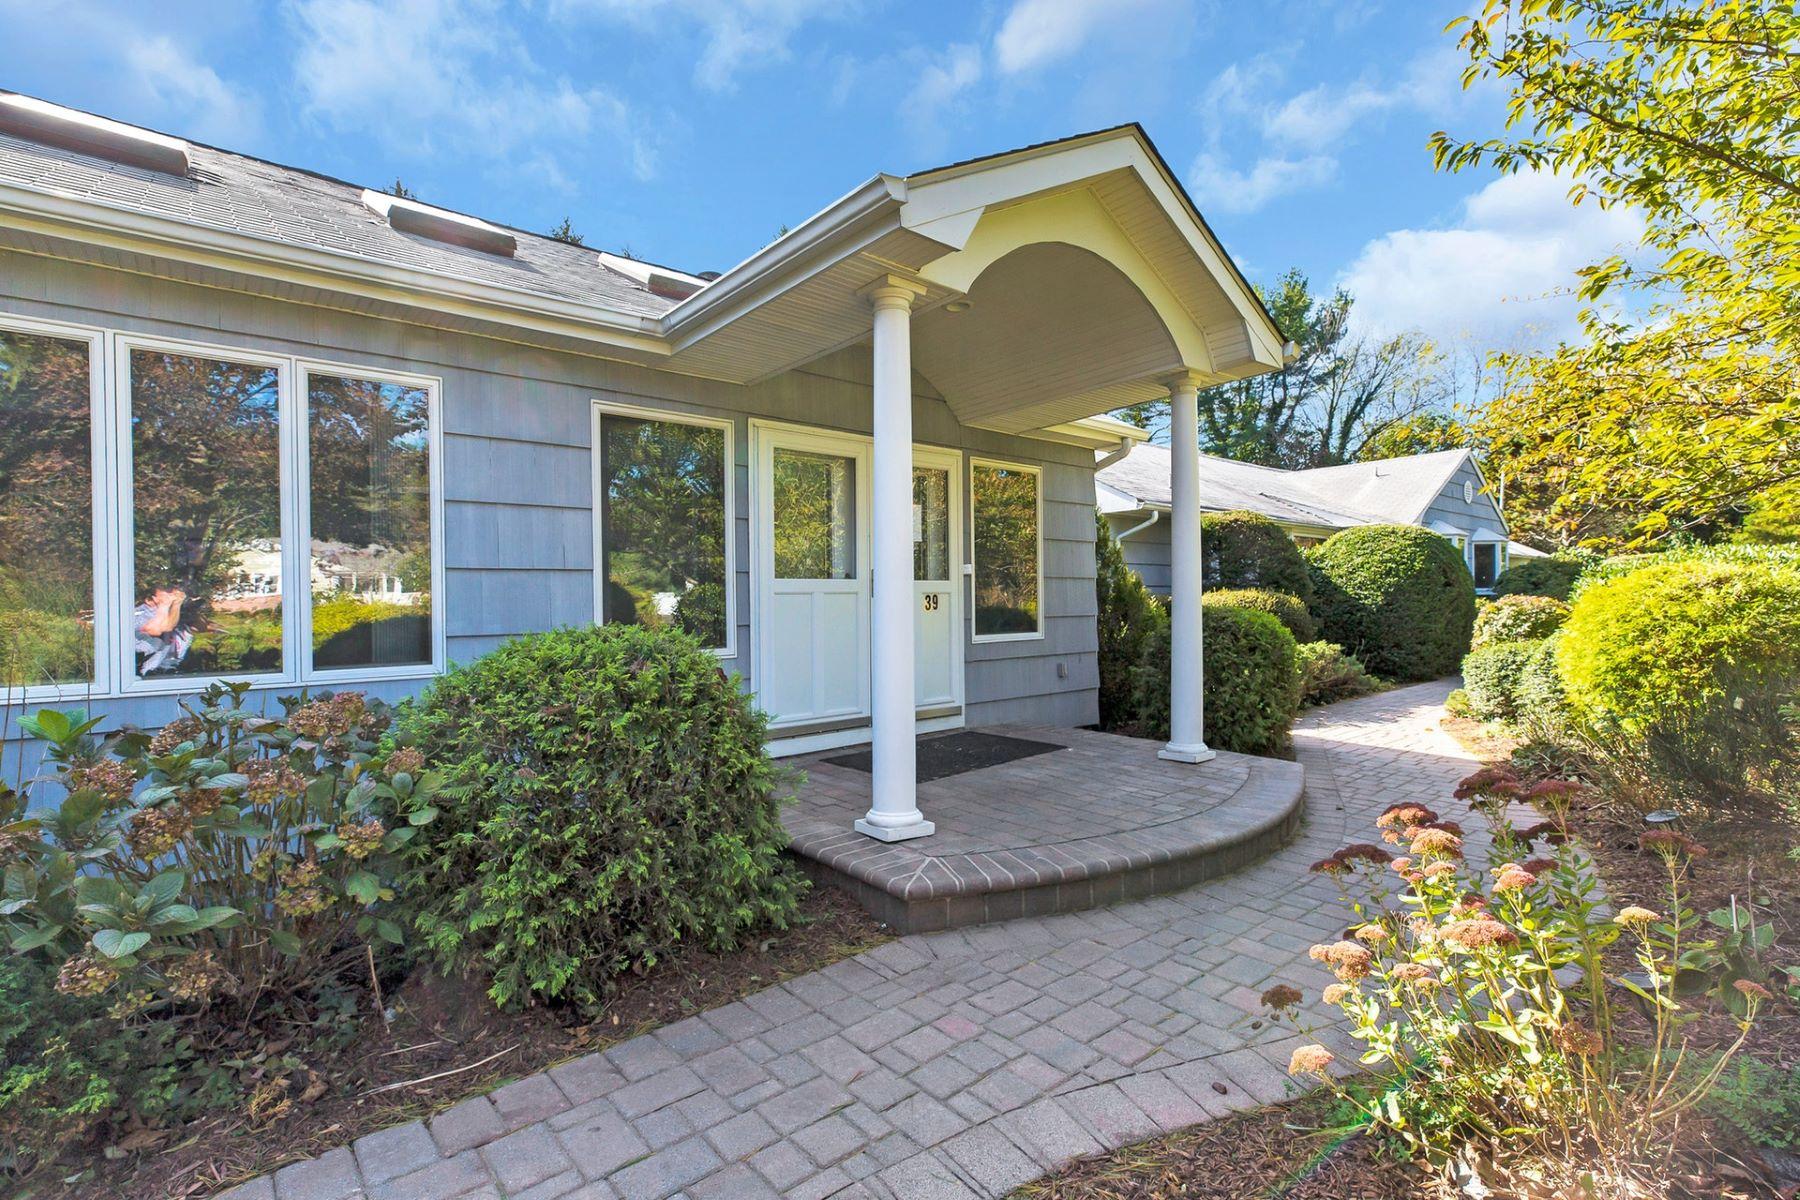 Single Family Homes für Verkauf beim Cold Spring Hrbr 39 Eastwoods Dr, Cold Spring Harbor, New York 11724 Vereinigte Staaten